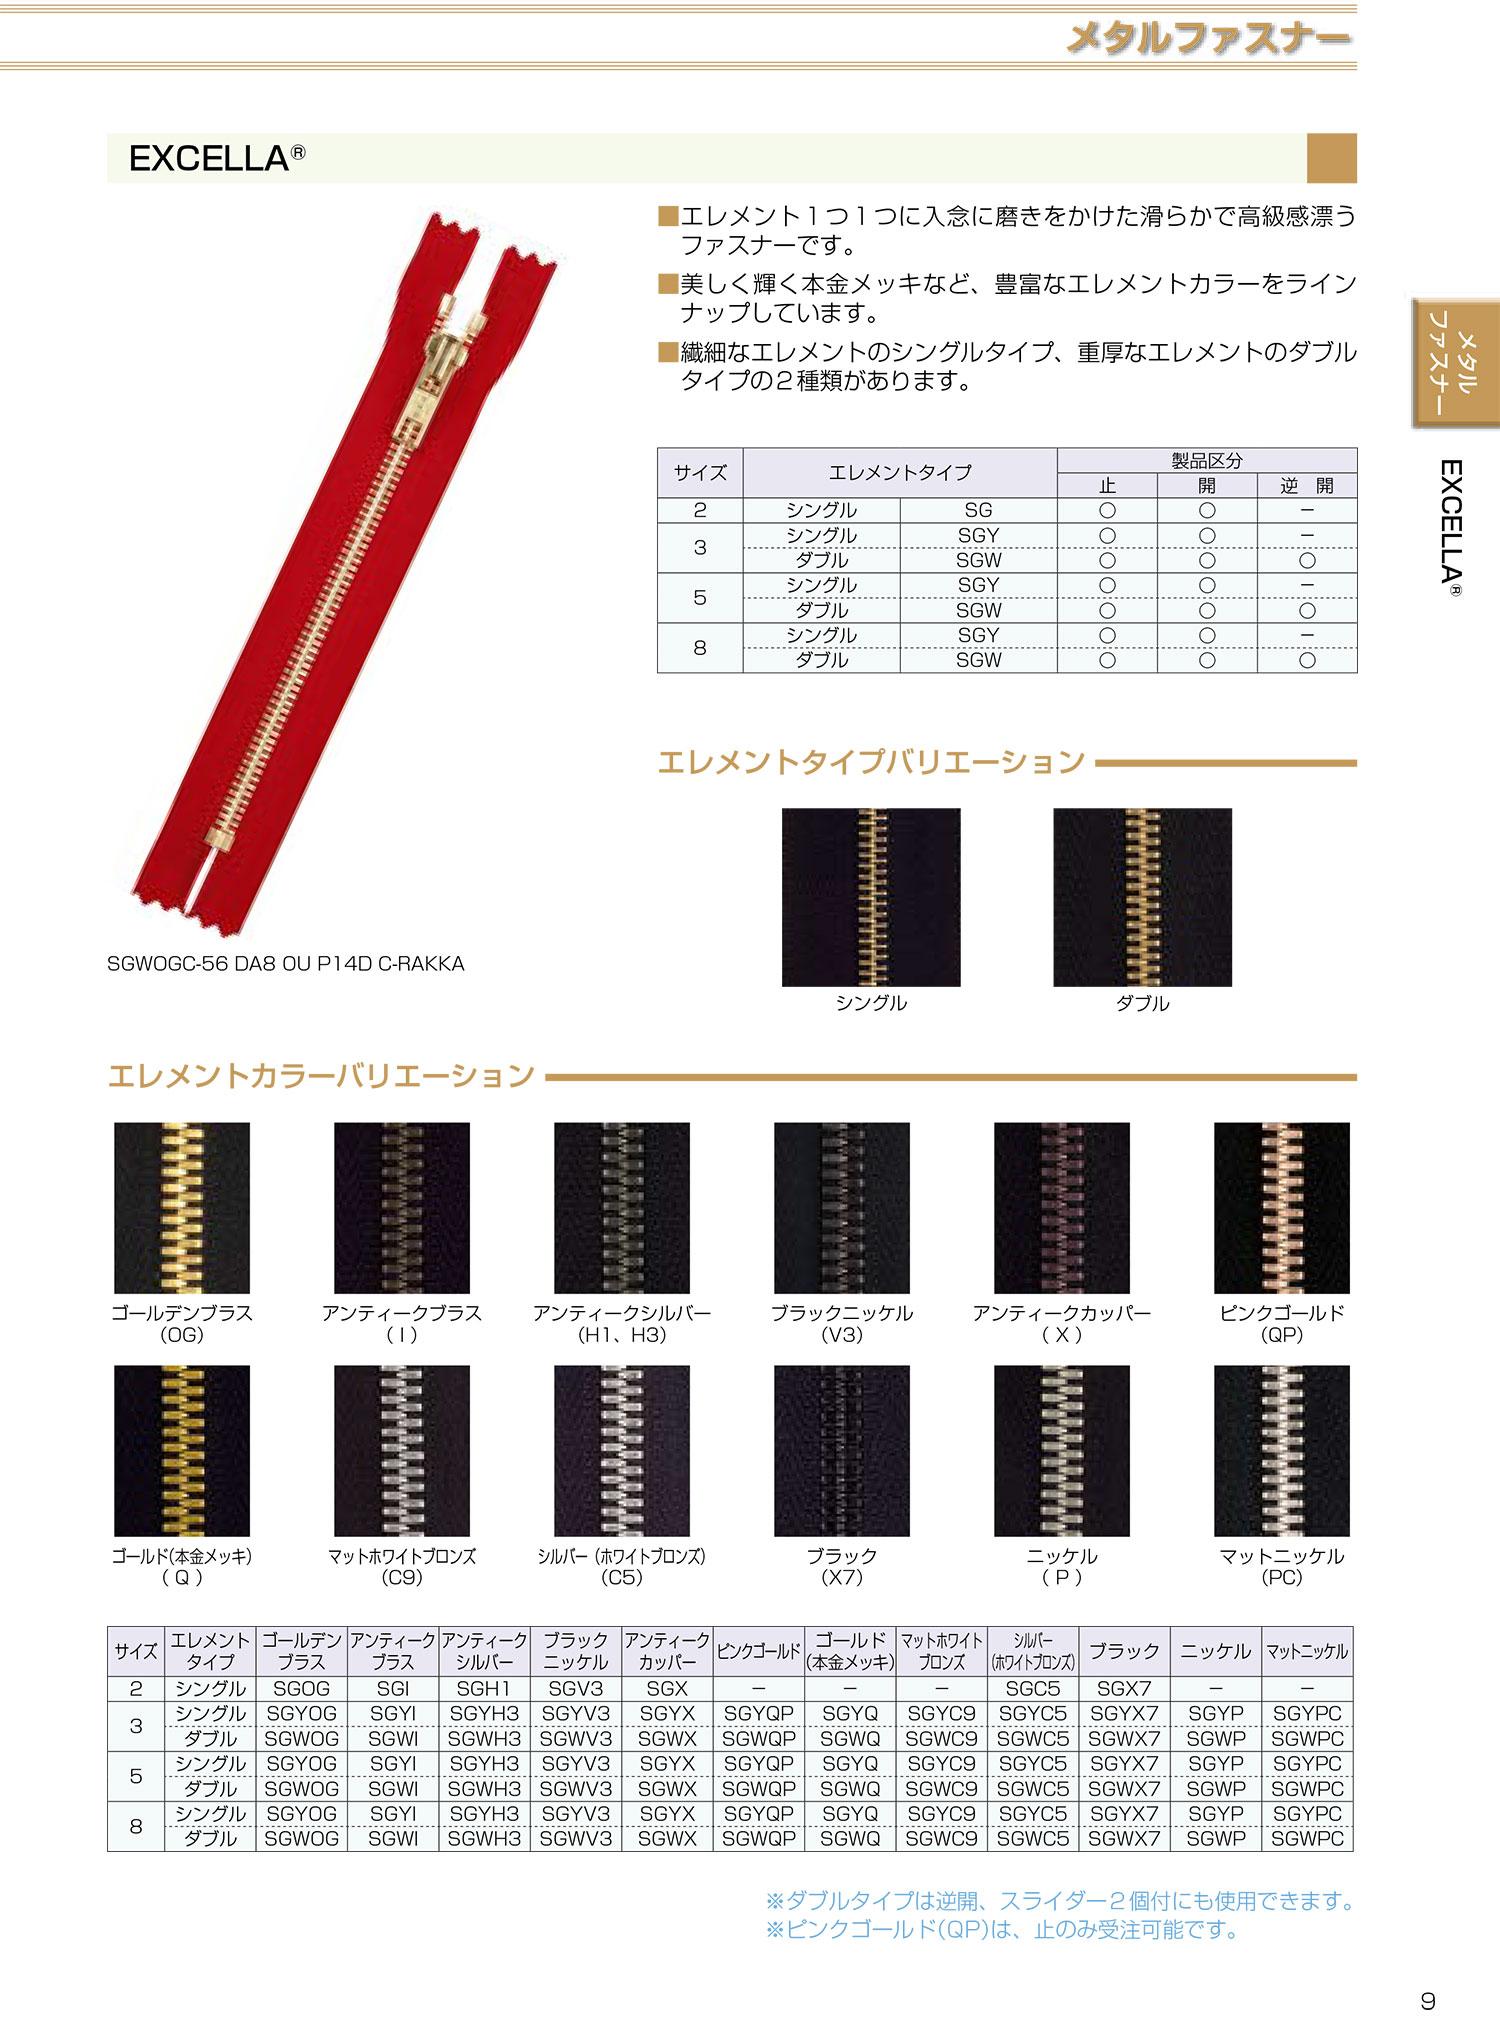 5SGWPCMR エクセラ 5サイズ マットニッケル 逆開 ダブル[ファスナー] YKK/オークラ商事 - ApparelX アパレル資材卸通販